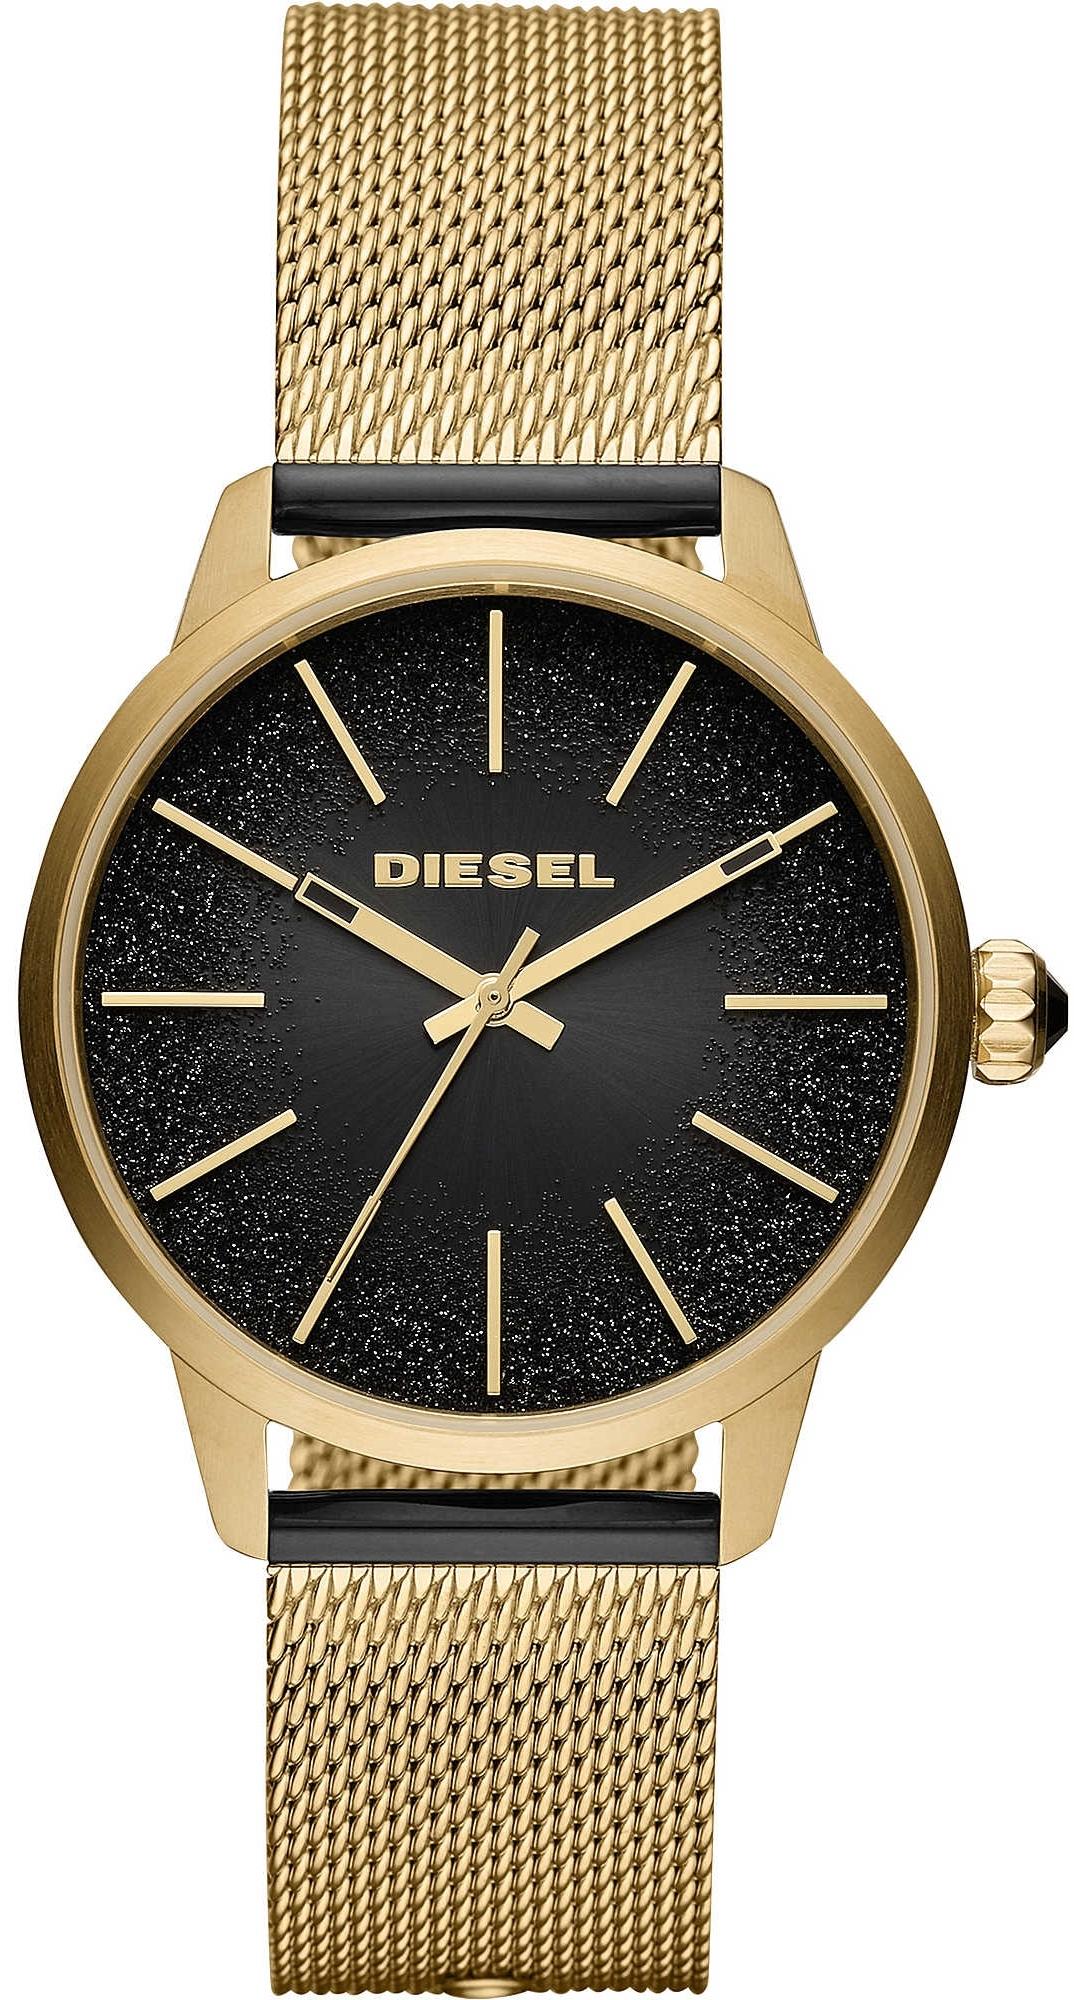 Diesel Castilia Dameur DZ5576 Sort/Gul guldtonet stål Ø44 mm